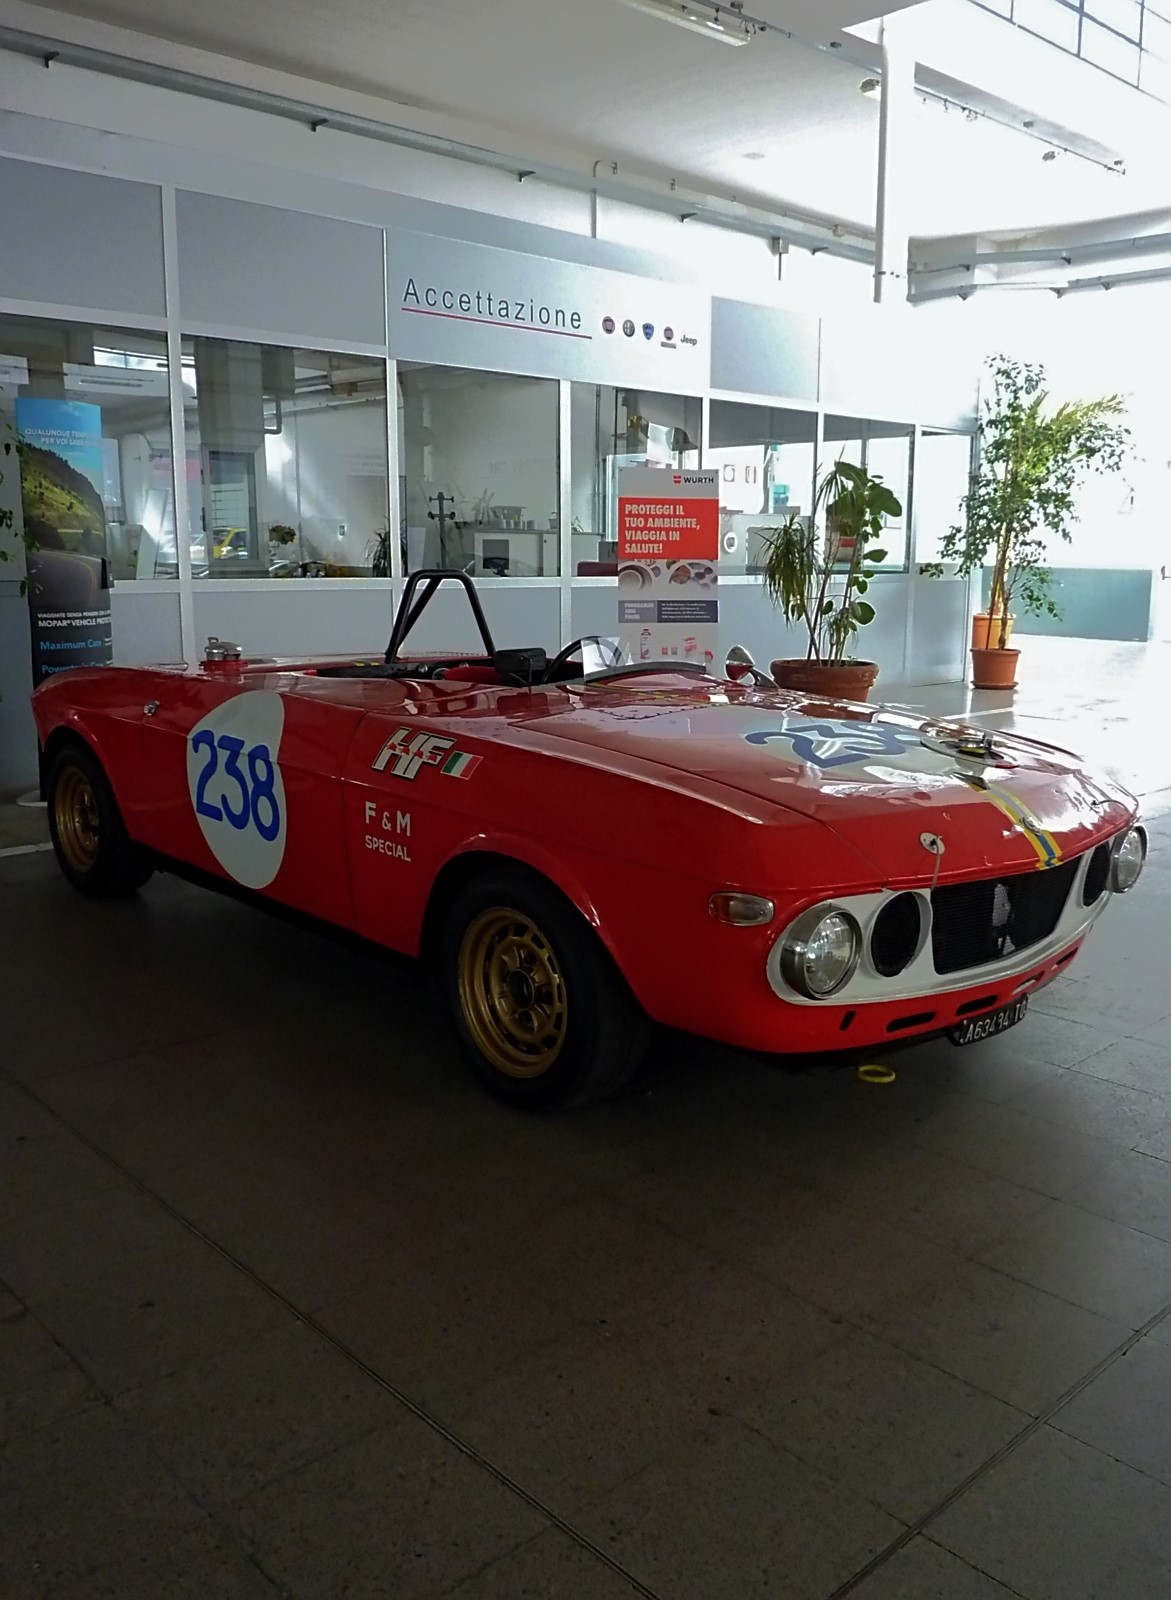 1969 Lancia Fulvia HF Barchetta F&M (Sandro  Munari) (8)